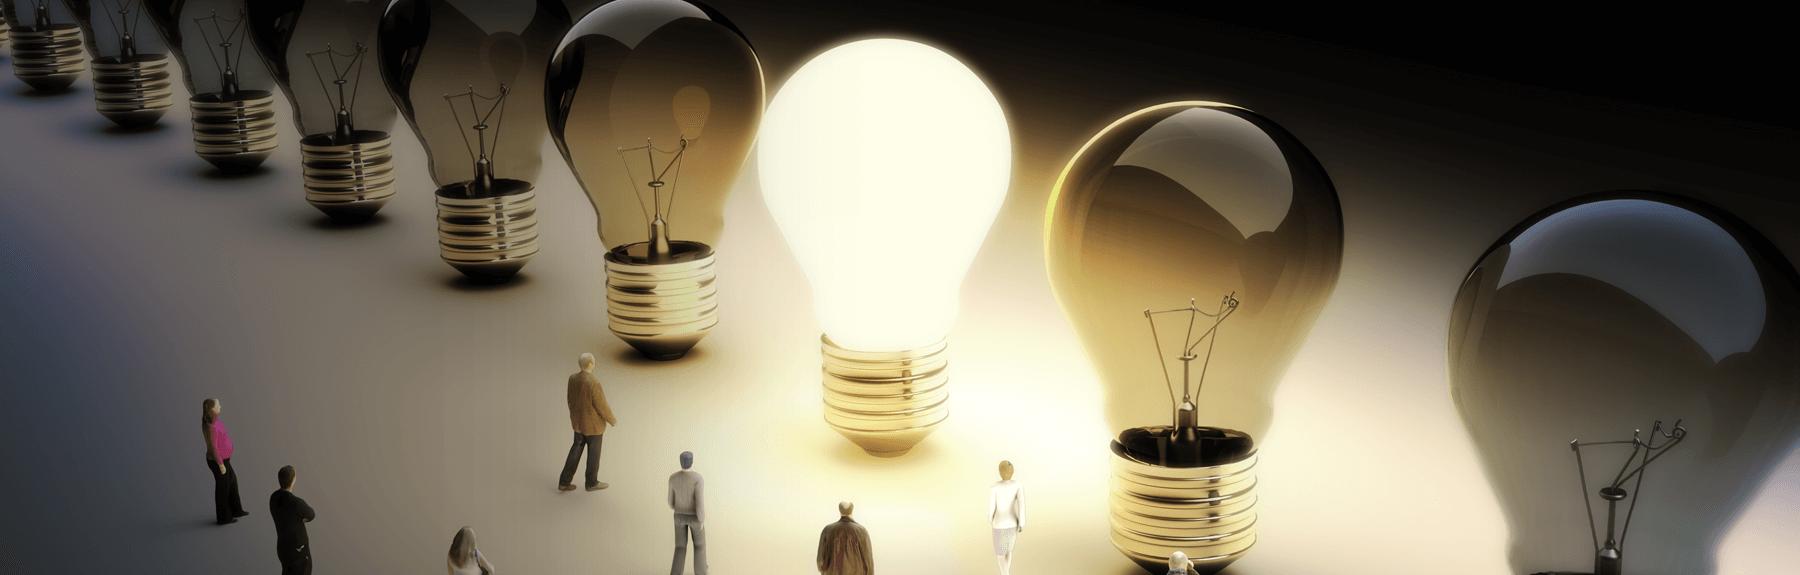 design-idea-high-fidelity-prototype